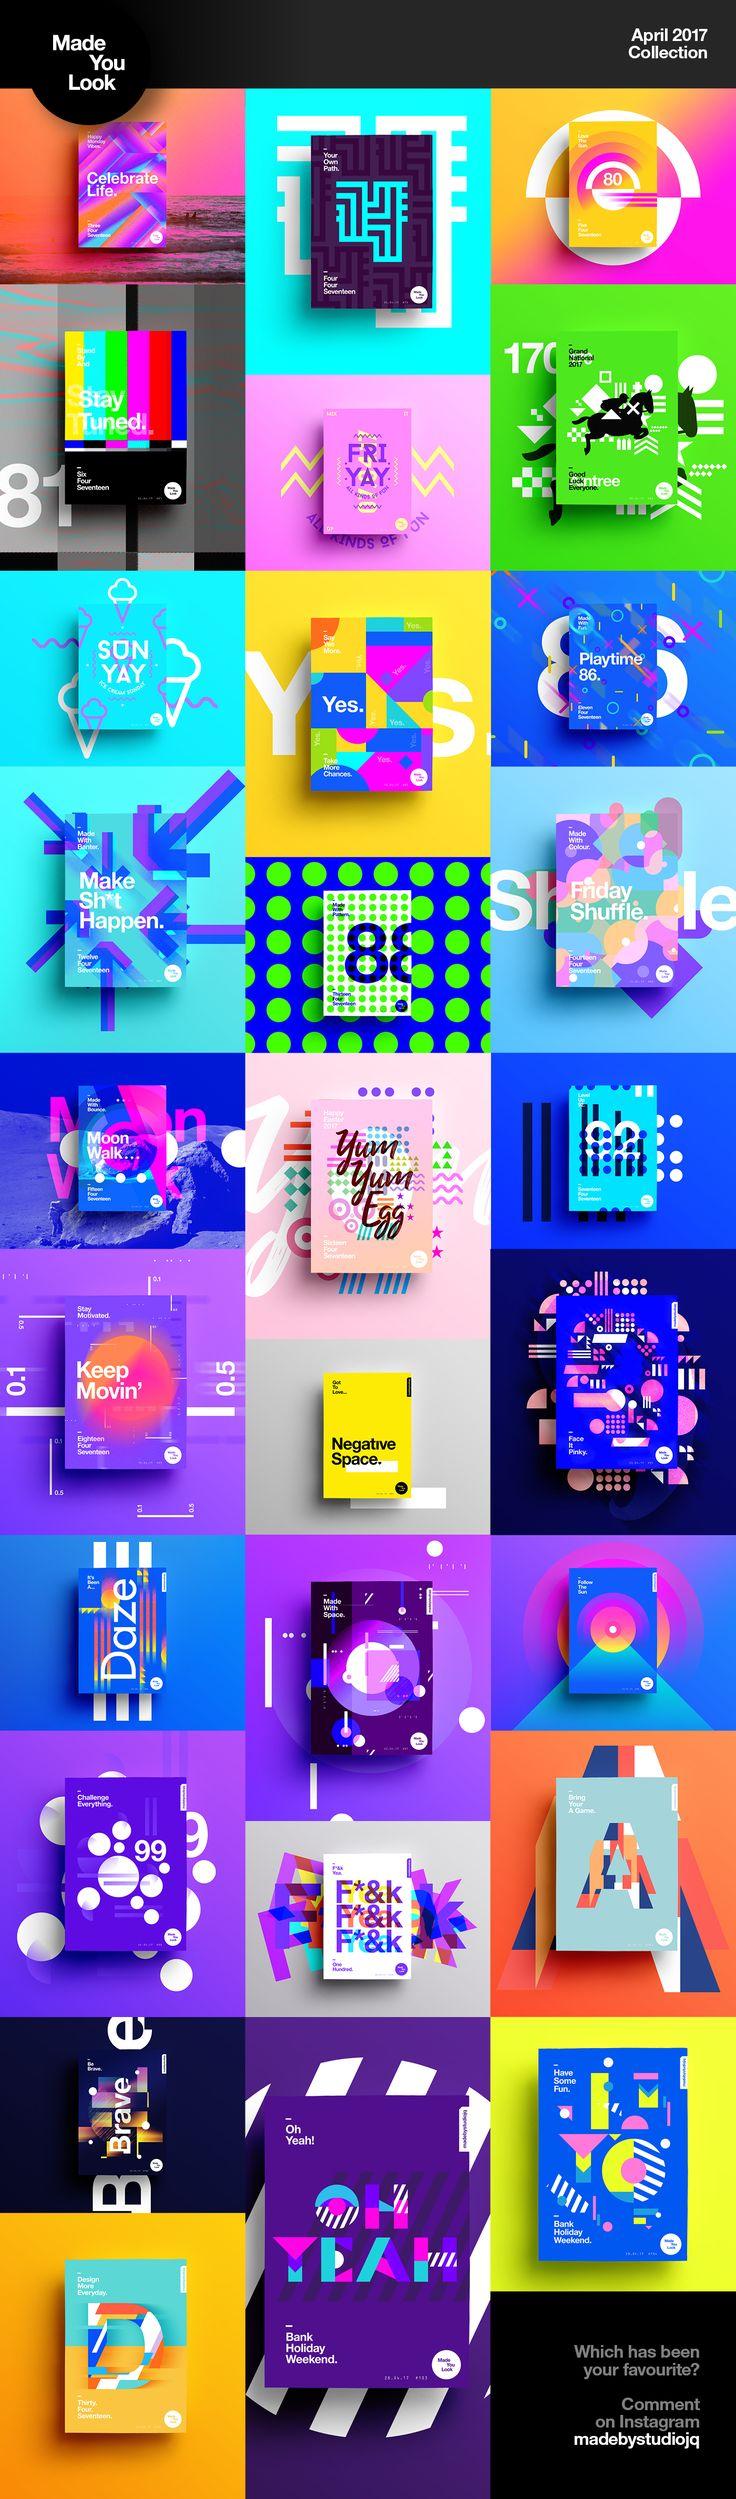 Studiojq2017 posters2017 april